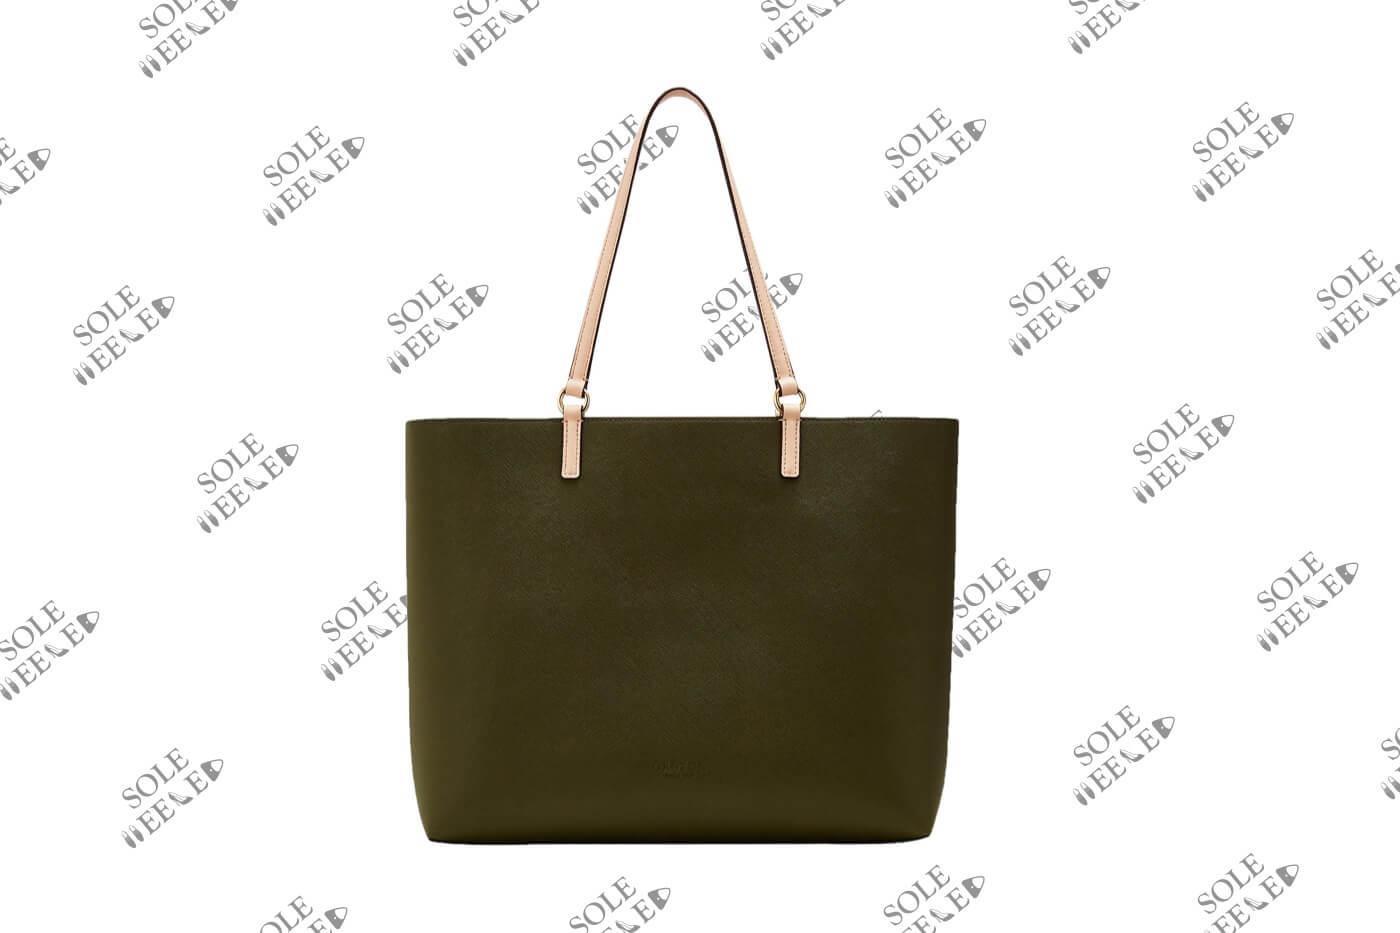 Oroton Handbag Closure Installation